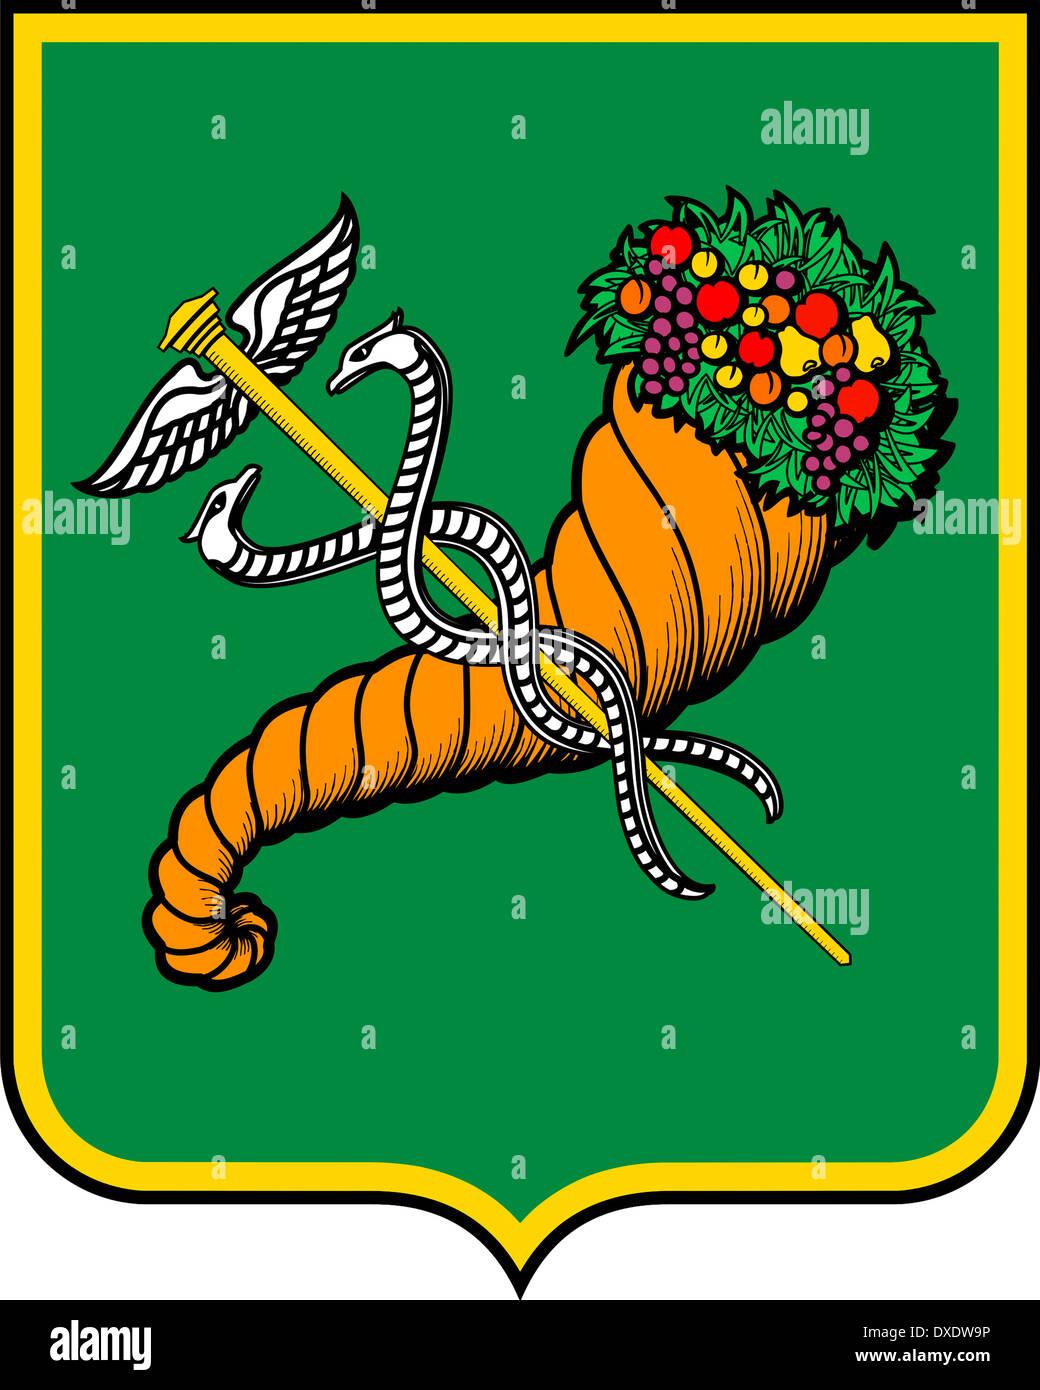 Coat of arms of the Ukrainian city of Kharkiv. - Stock Image